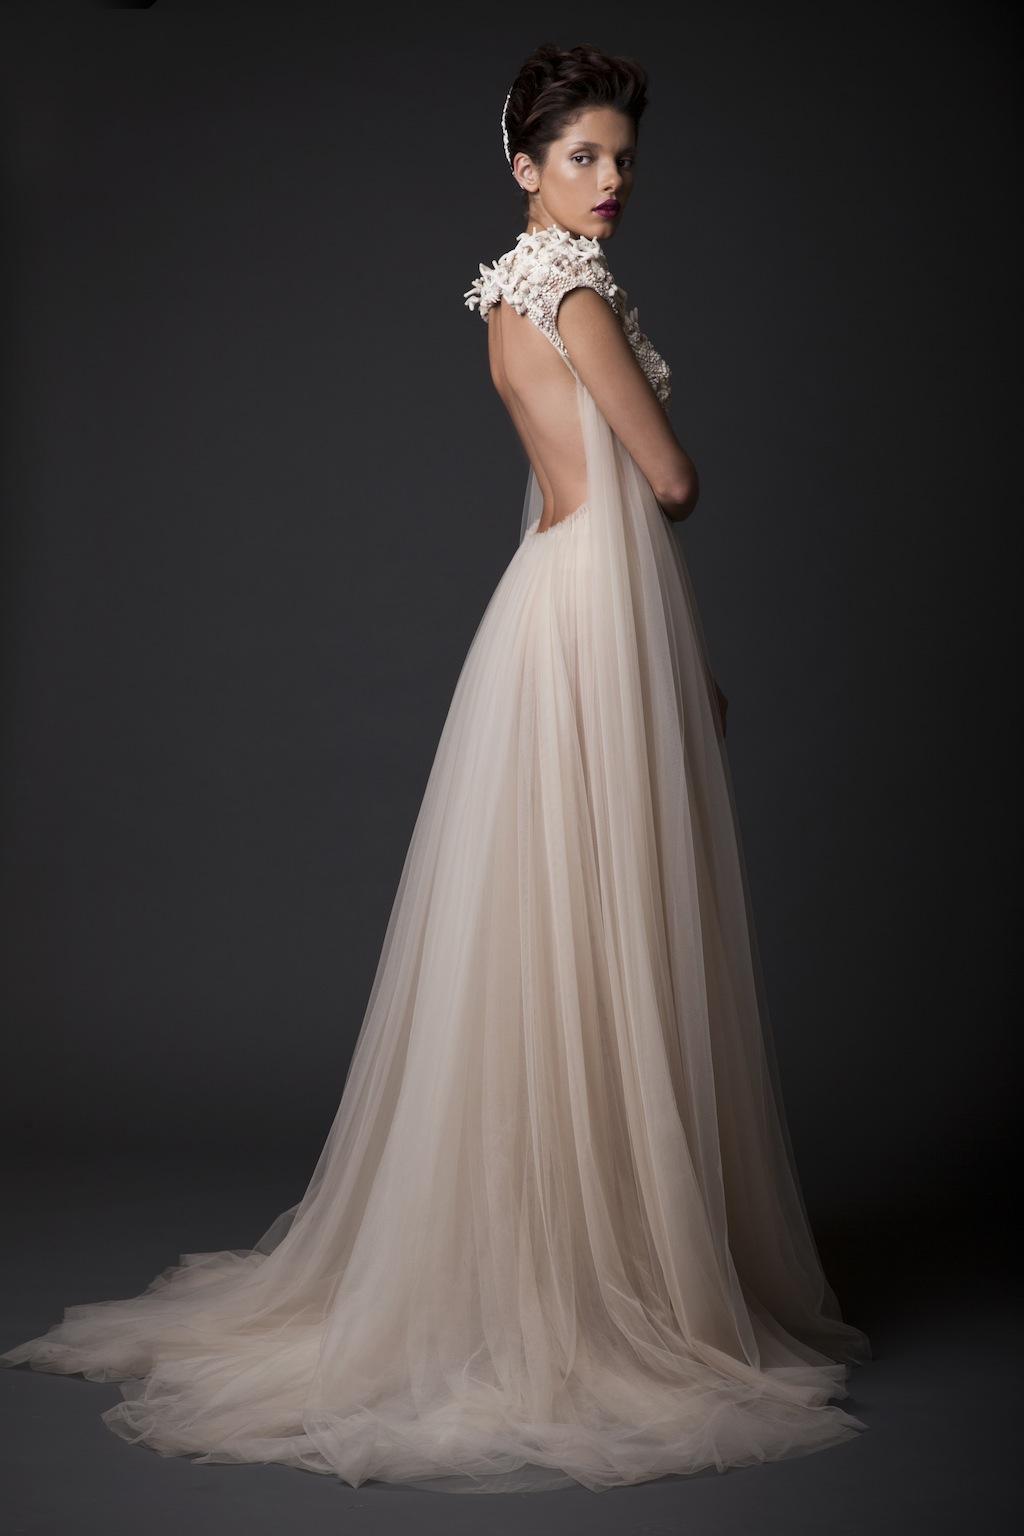 Wedding dress runaway bride  krikor jabotian  Weddings  Dresses  Pinterest  Wedding dress